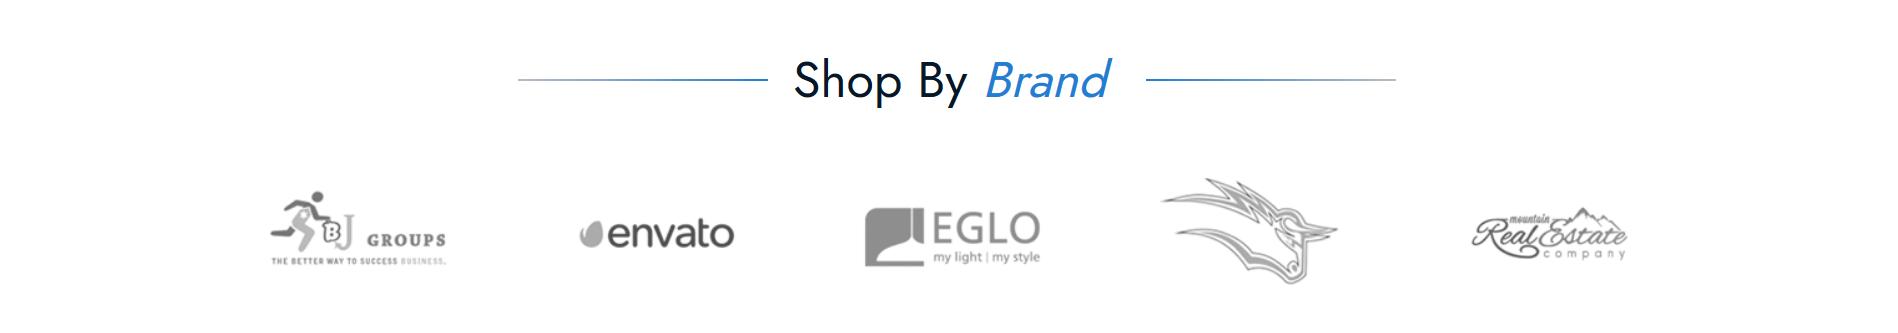 Brand Image Slider